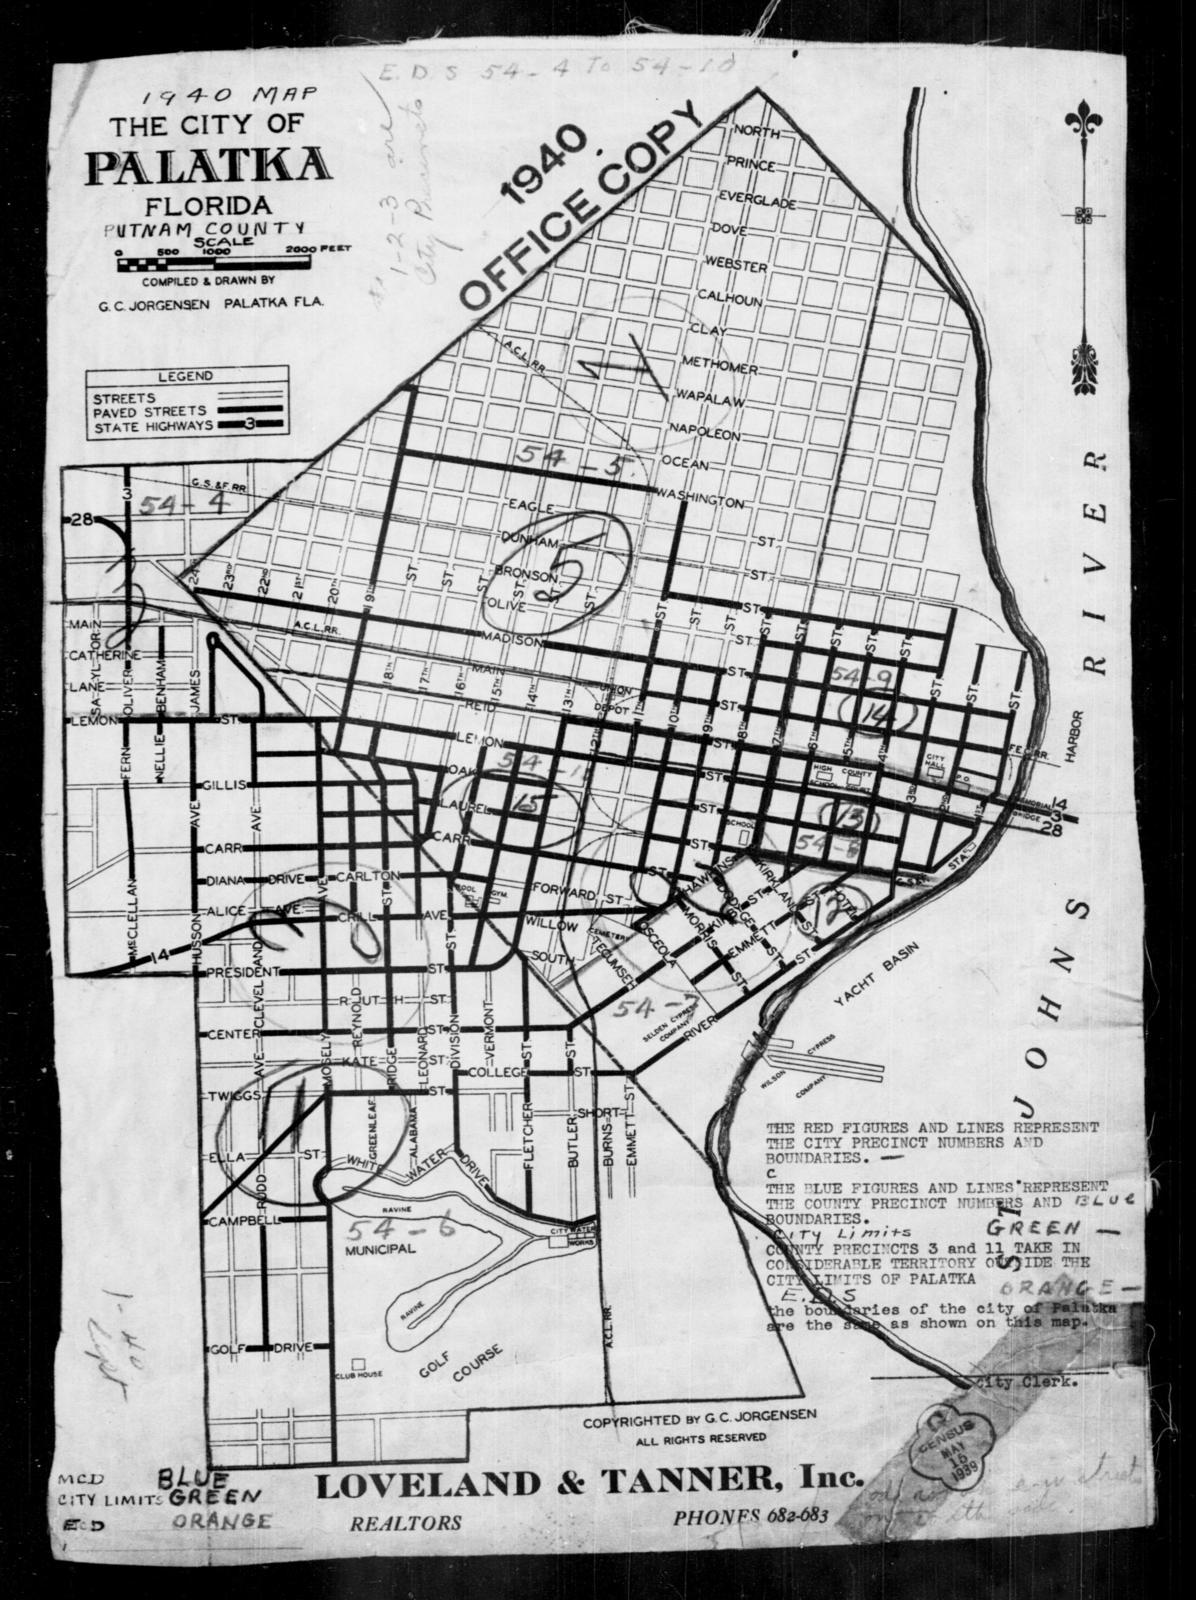 Palatka Florida Map.1940 Census Enumeration District Maps Florida Putnam County